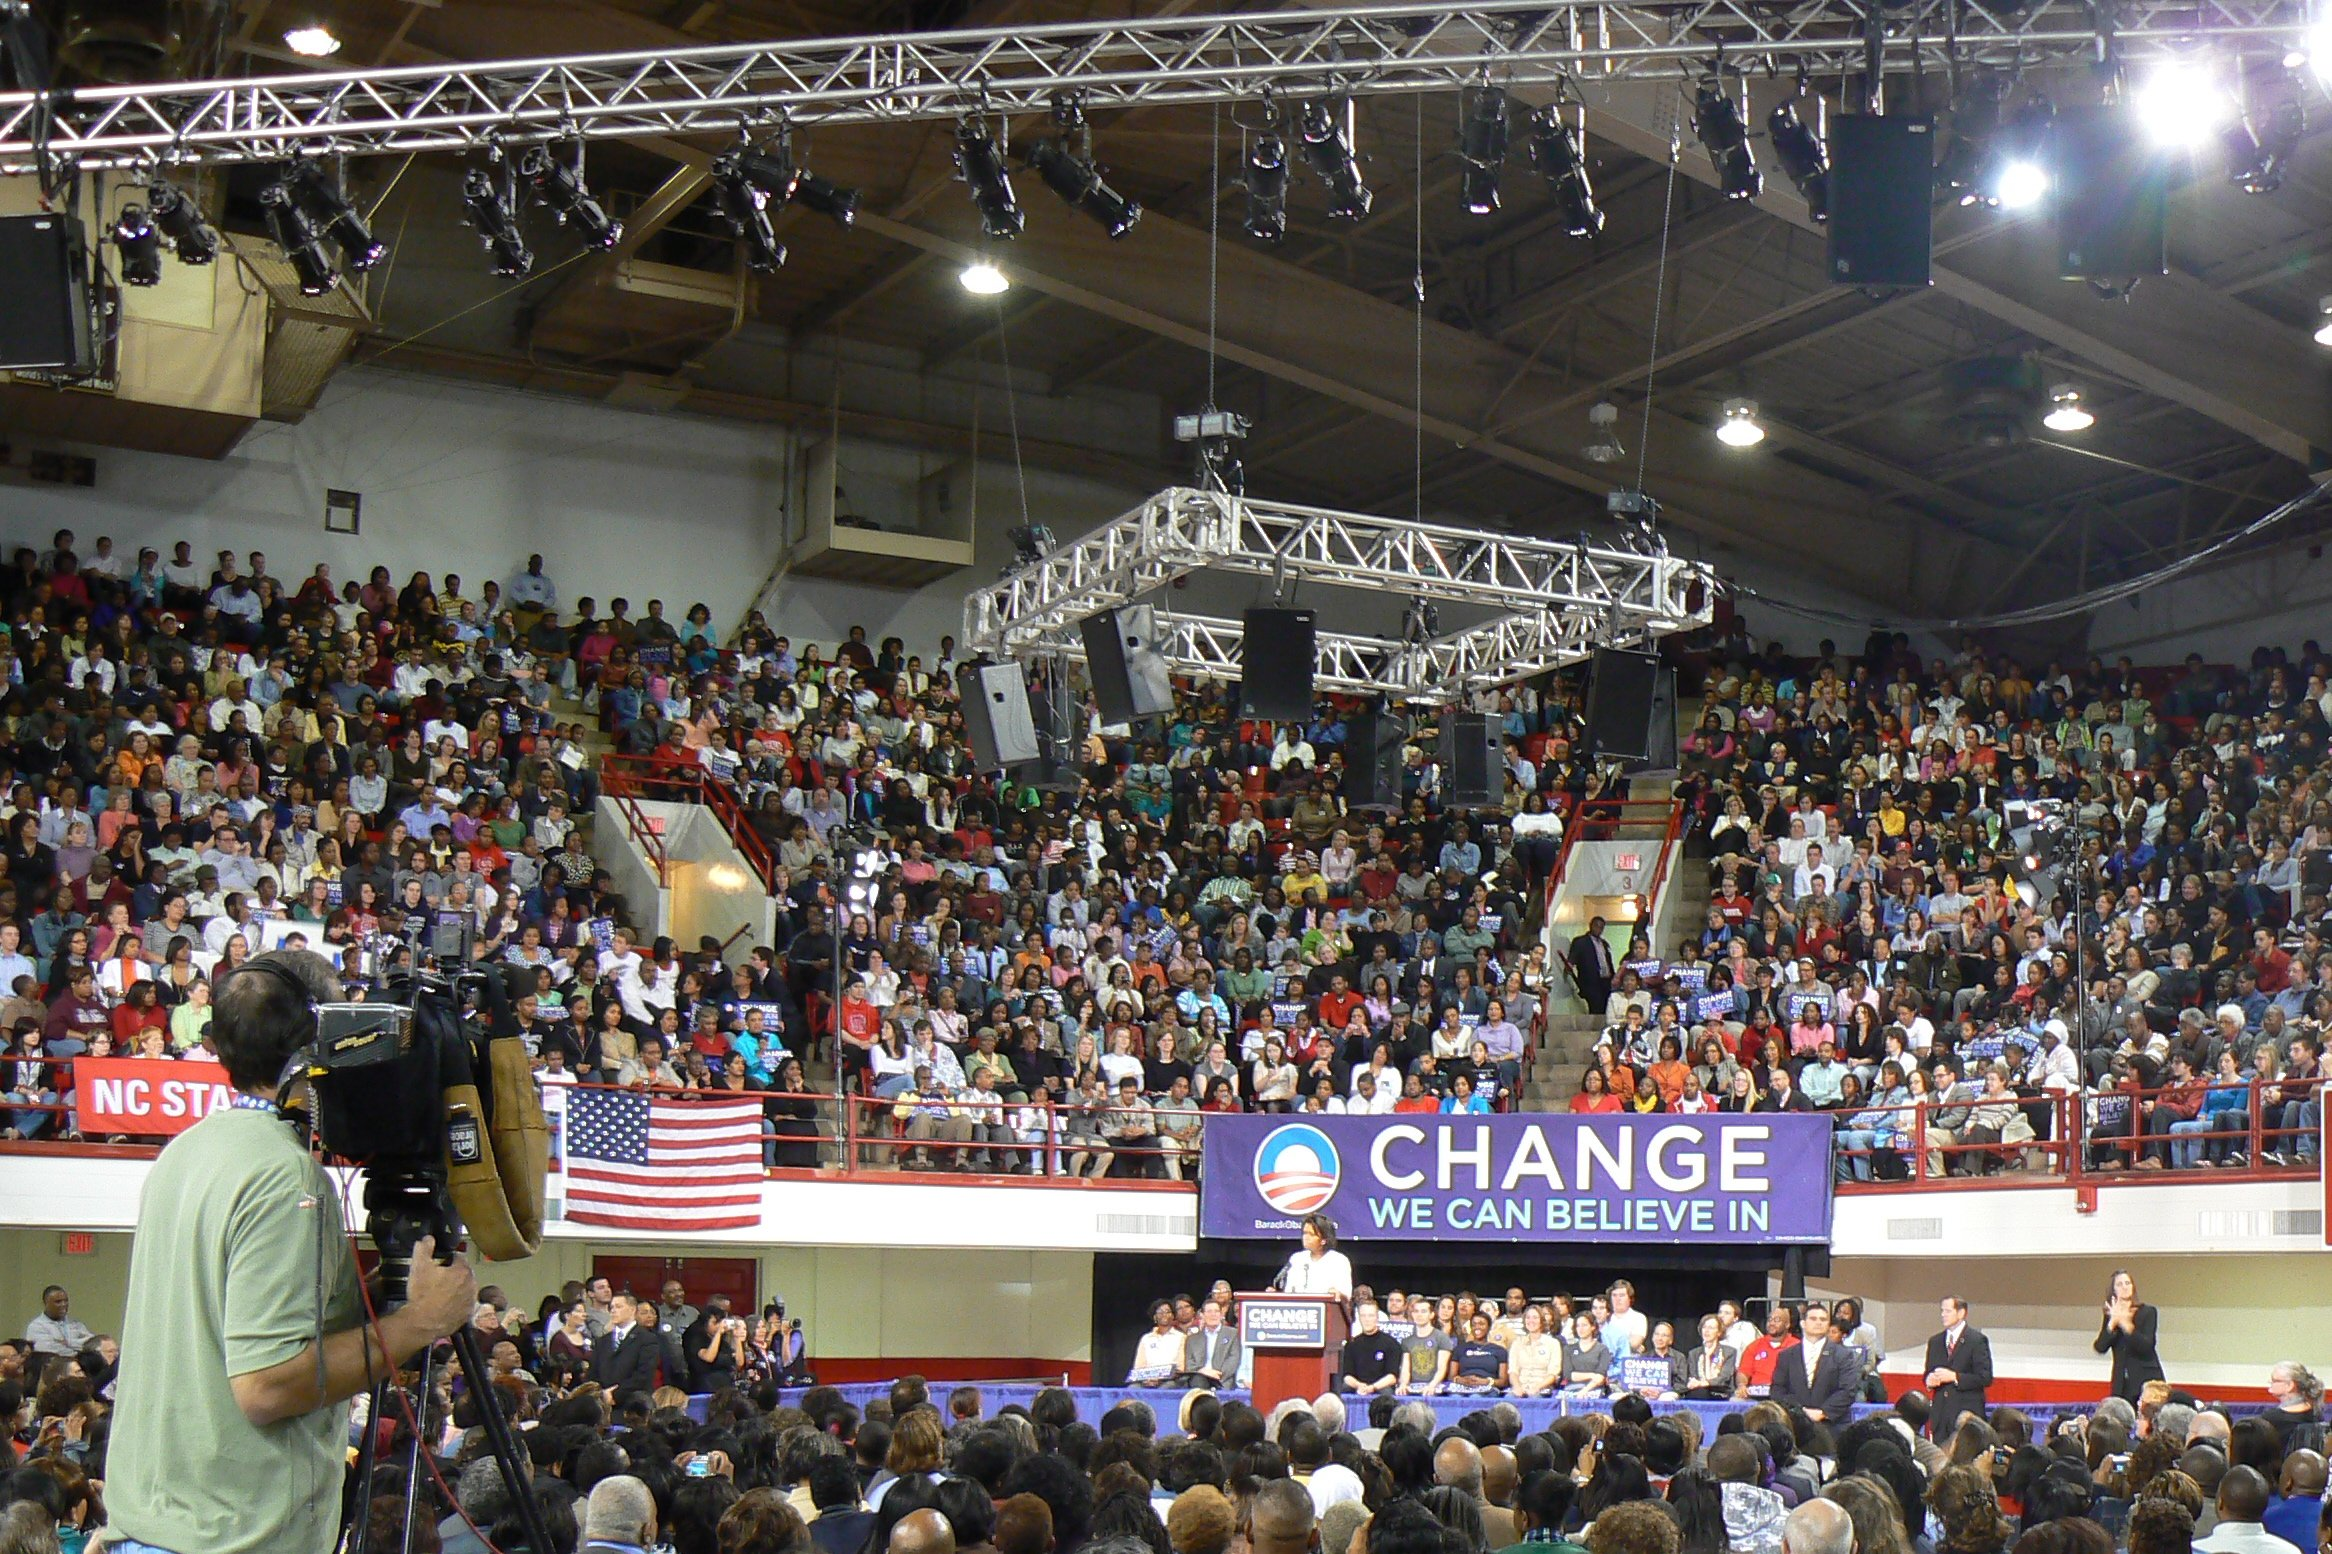 Basketball Arena Transformed for Political Event